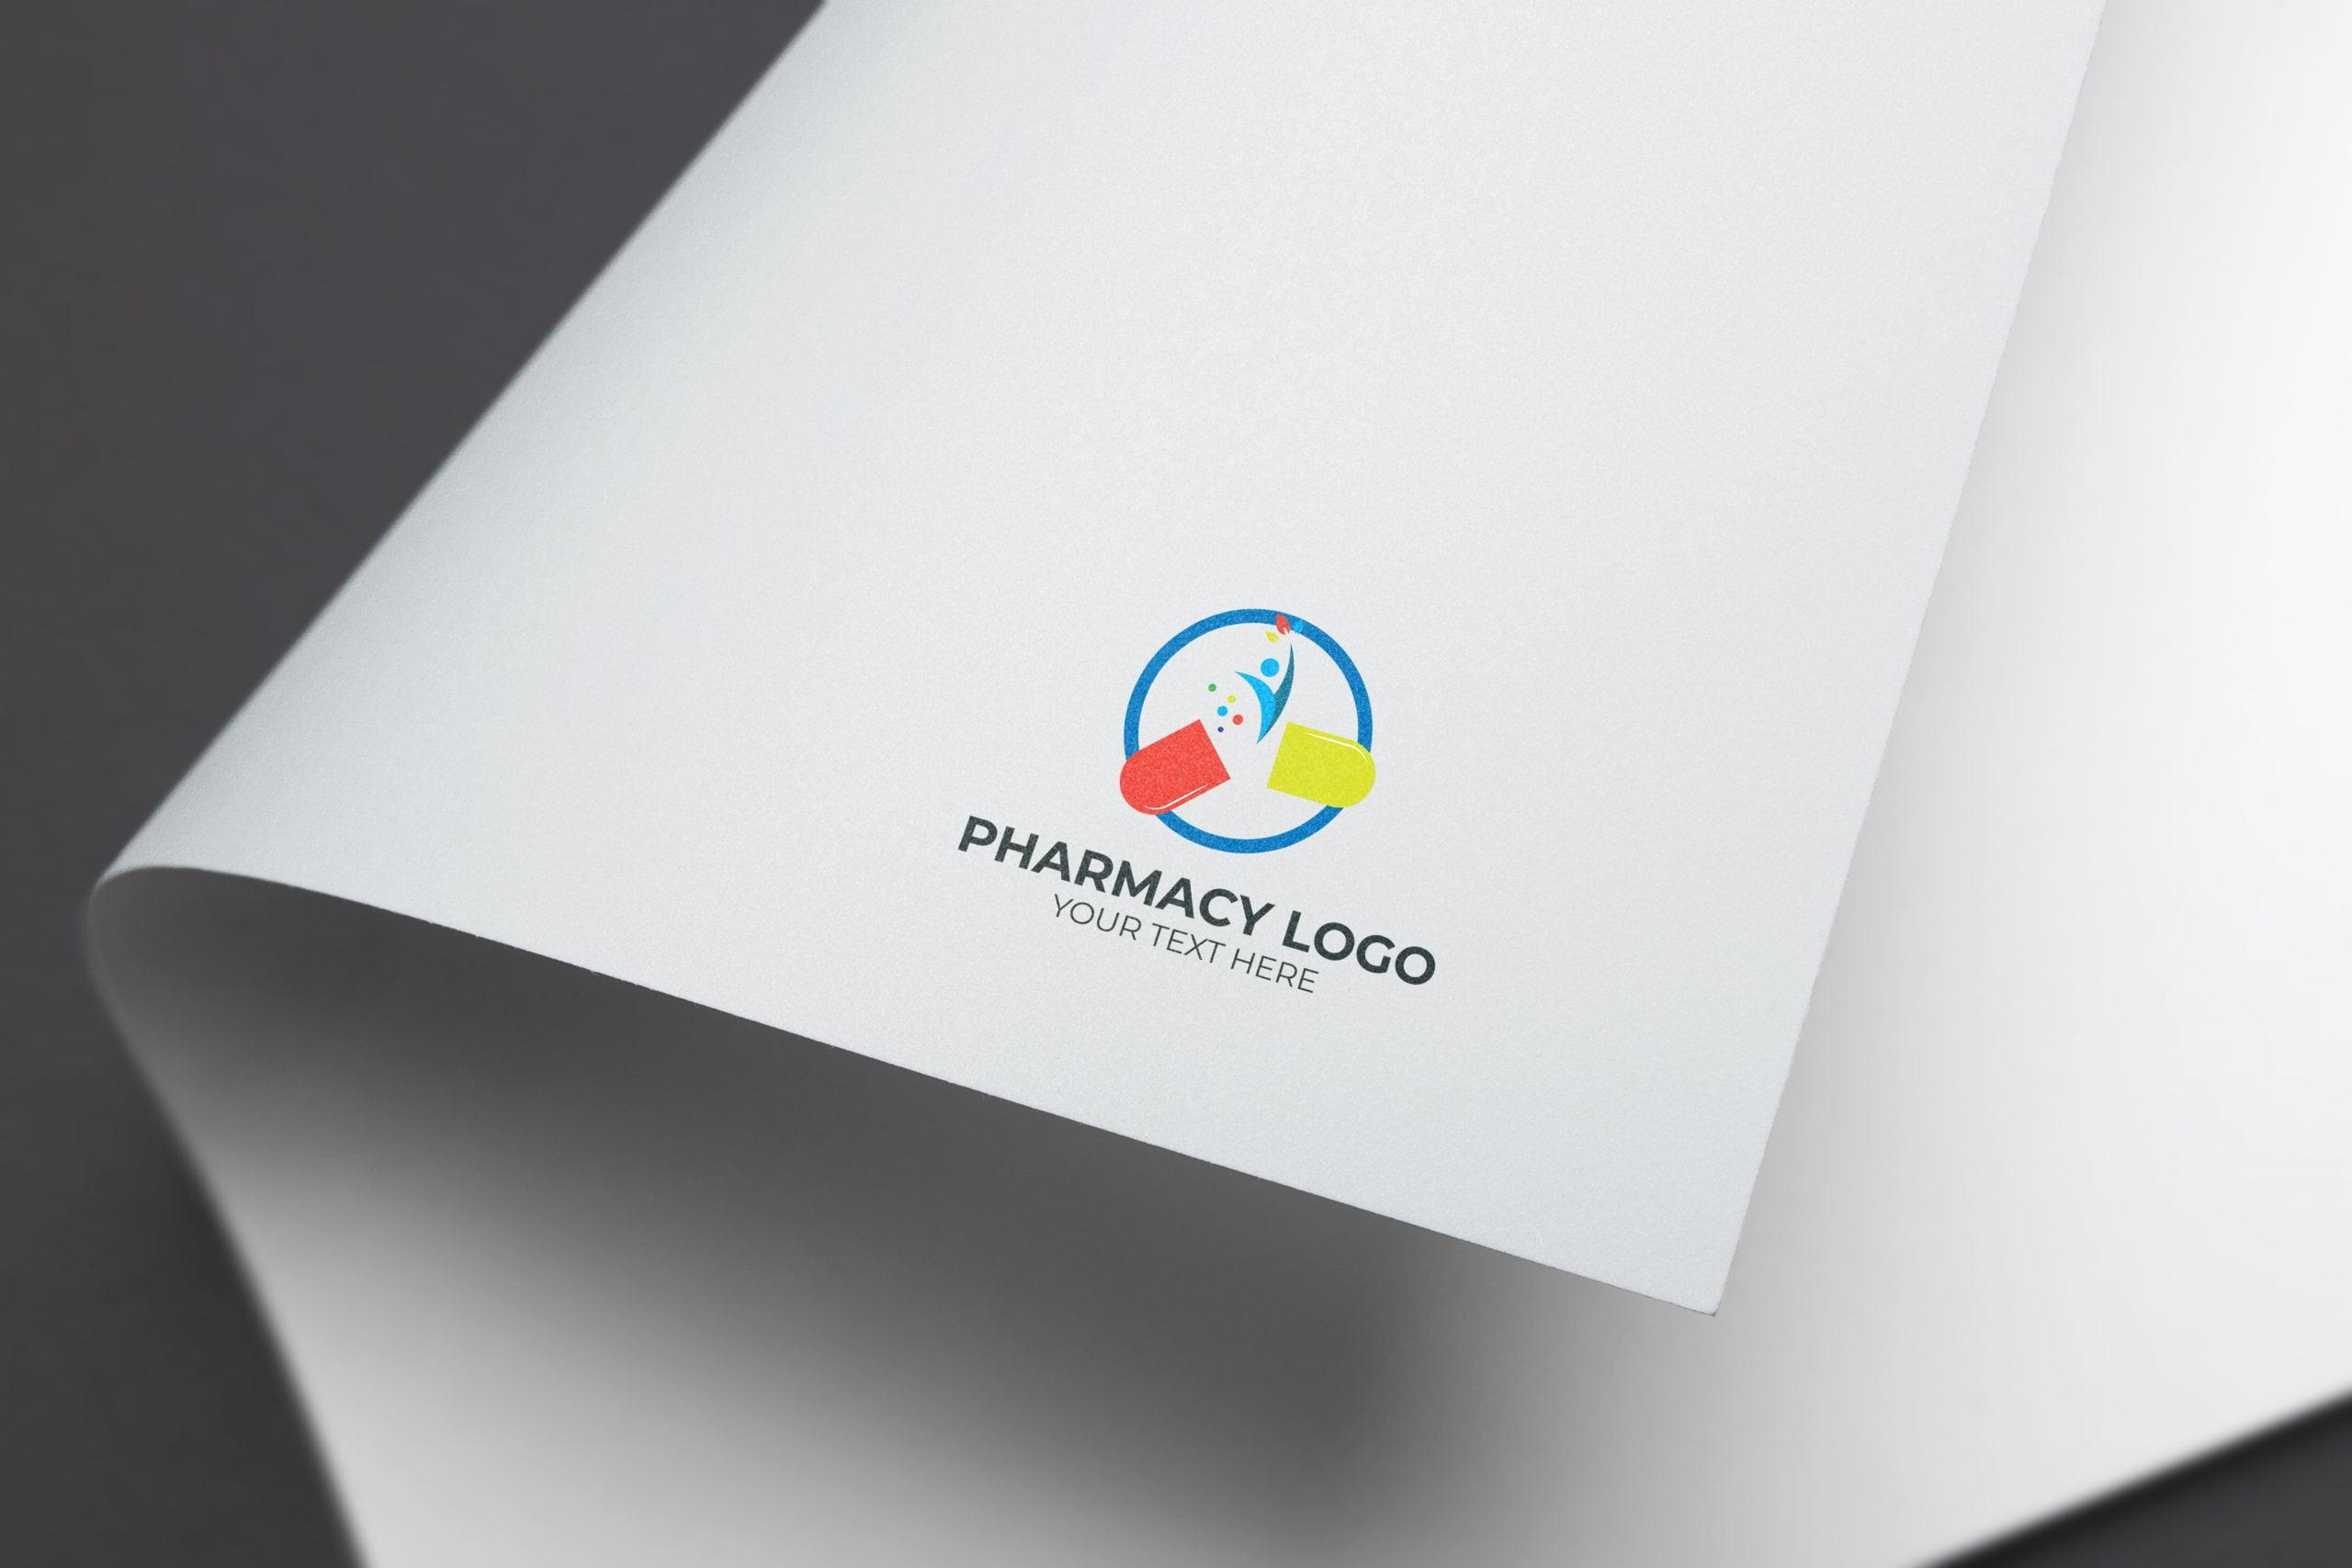 pharmacy logo paper mockups